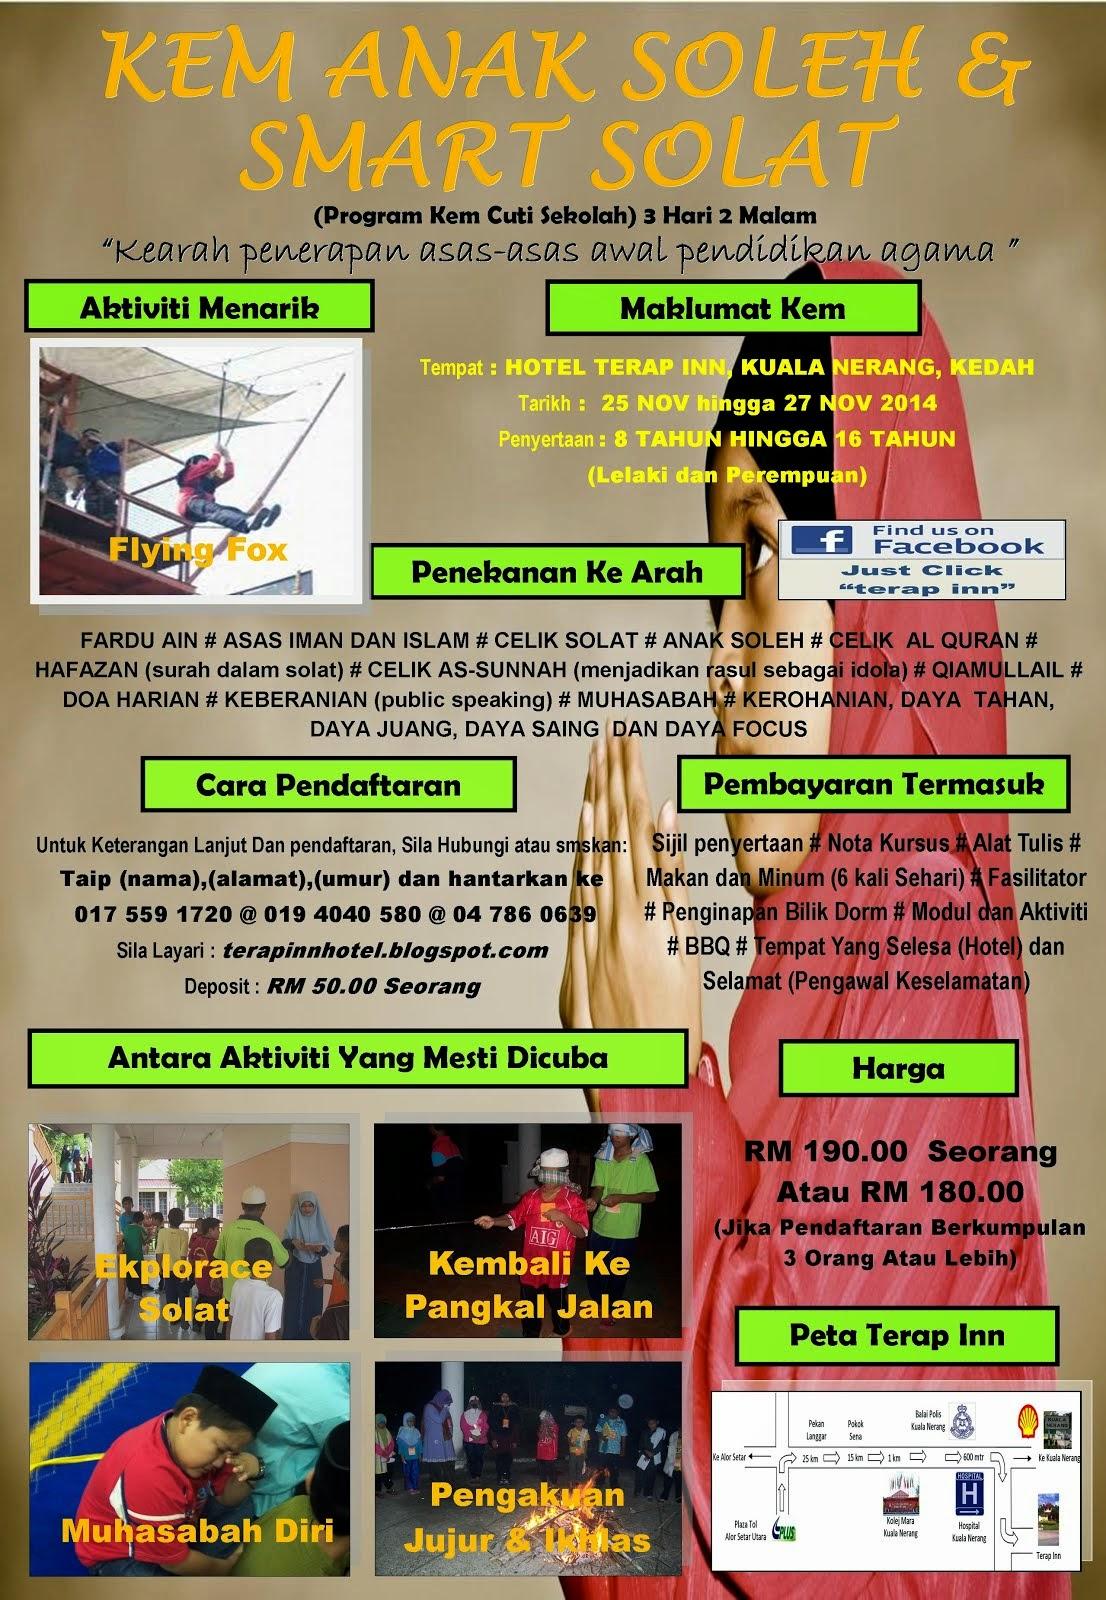 KEM ANAK SOLEH DAN SMART SOLAT EDISI NOVEMBER 2014